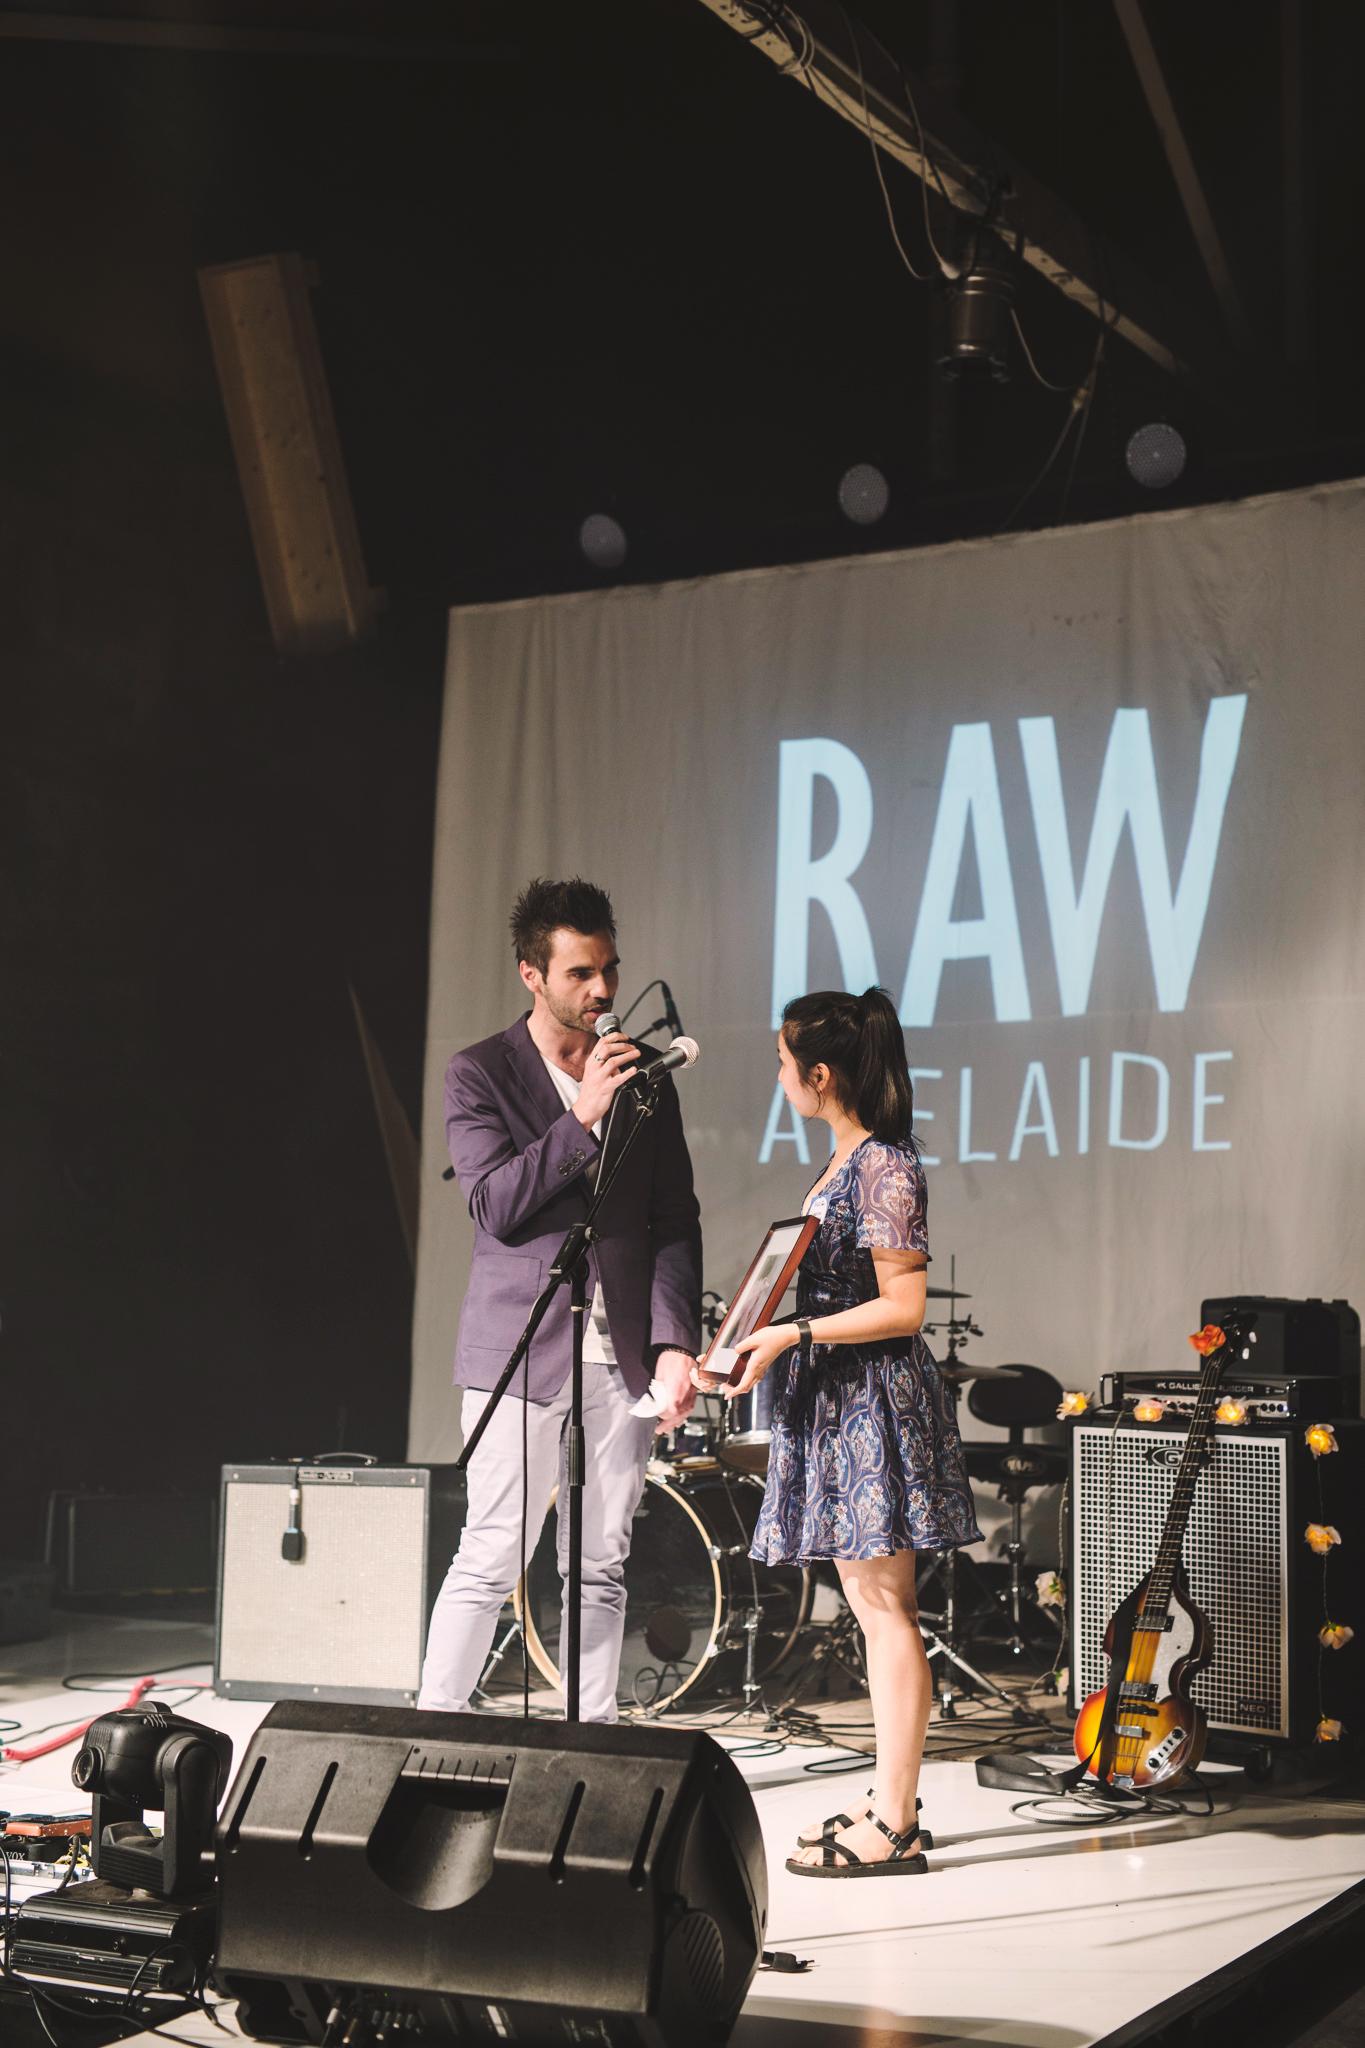 RAW-ADELAIDE_PRESENTS_MERGE_EVENT_161015_ARPHOTO_1210.jpg